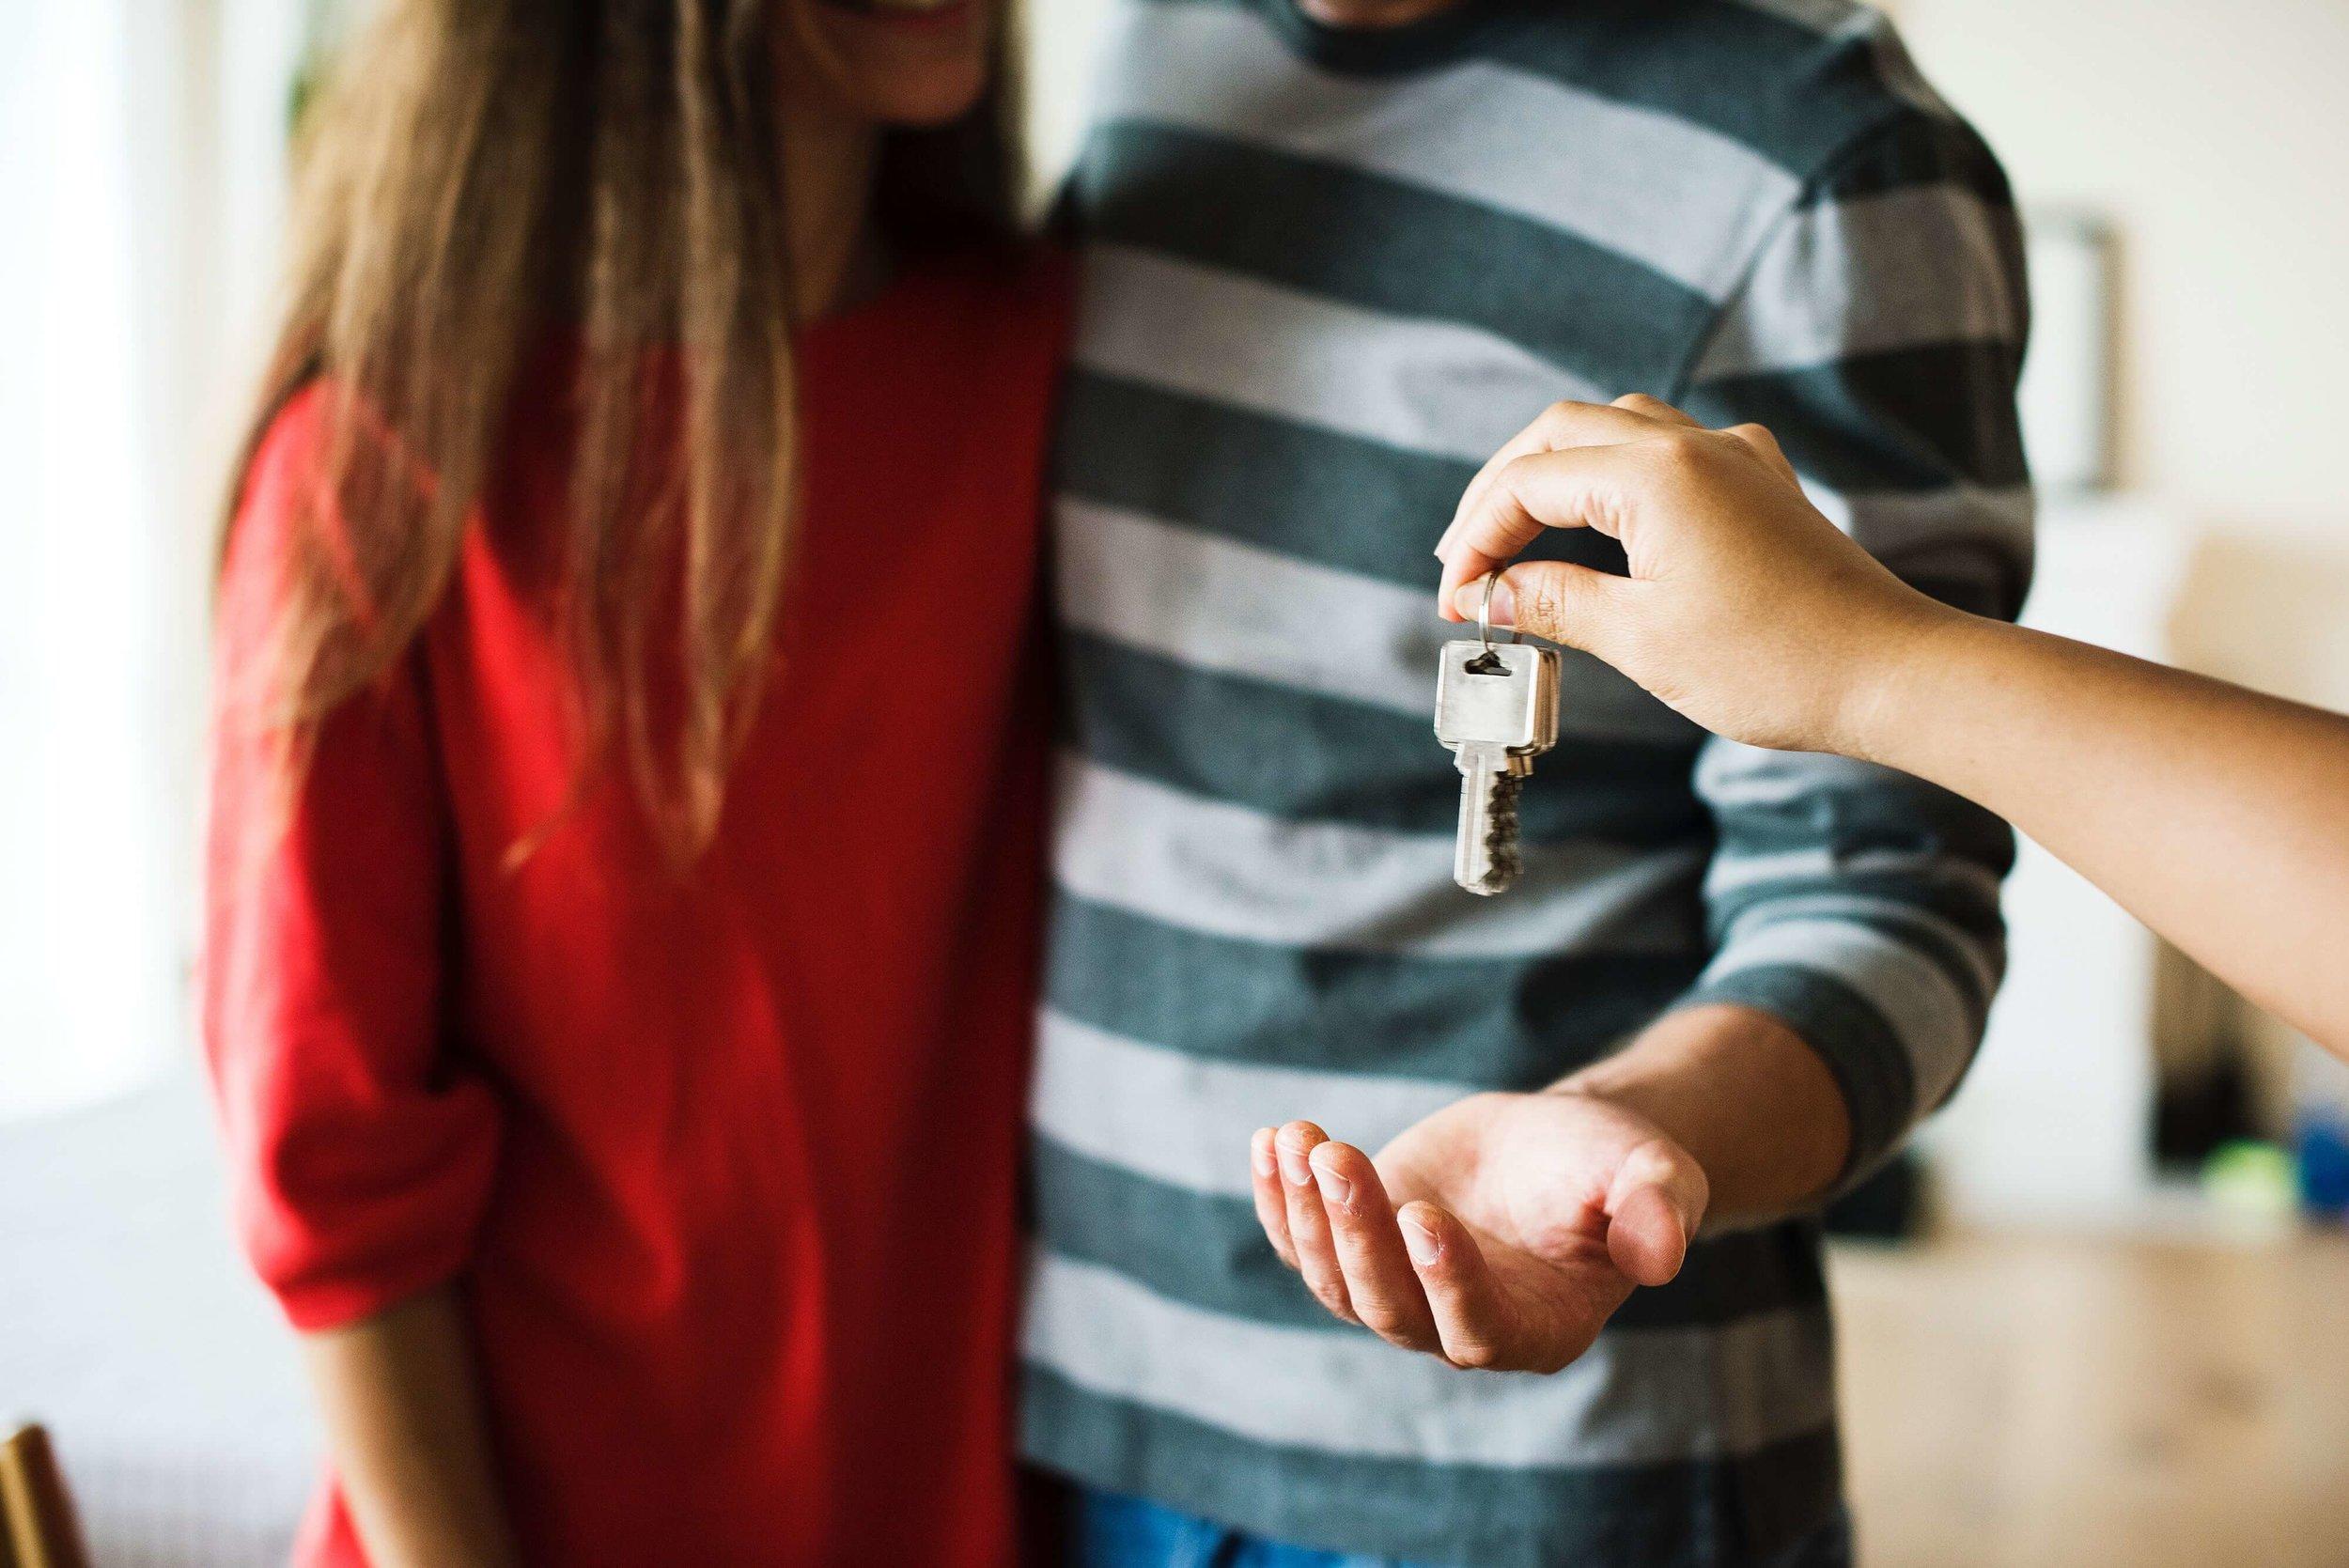 A couple holding keys